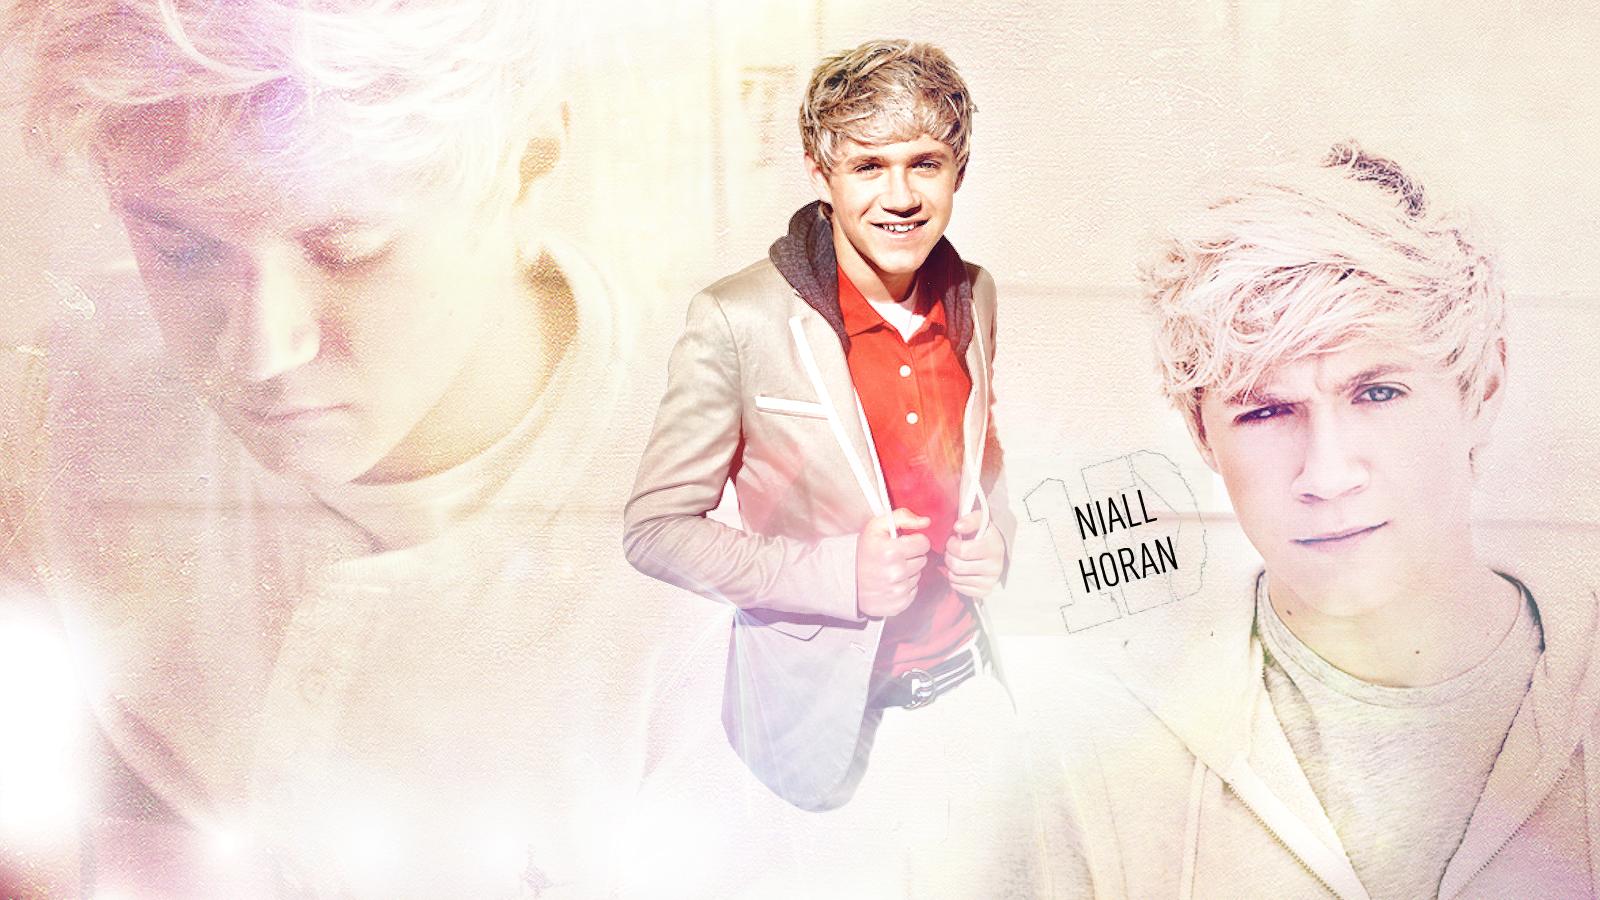 Niall Horan by AwelPrince